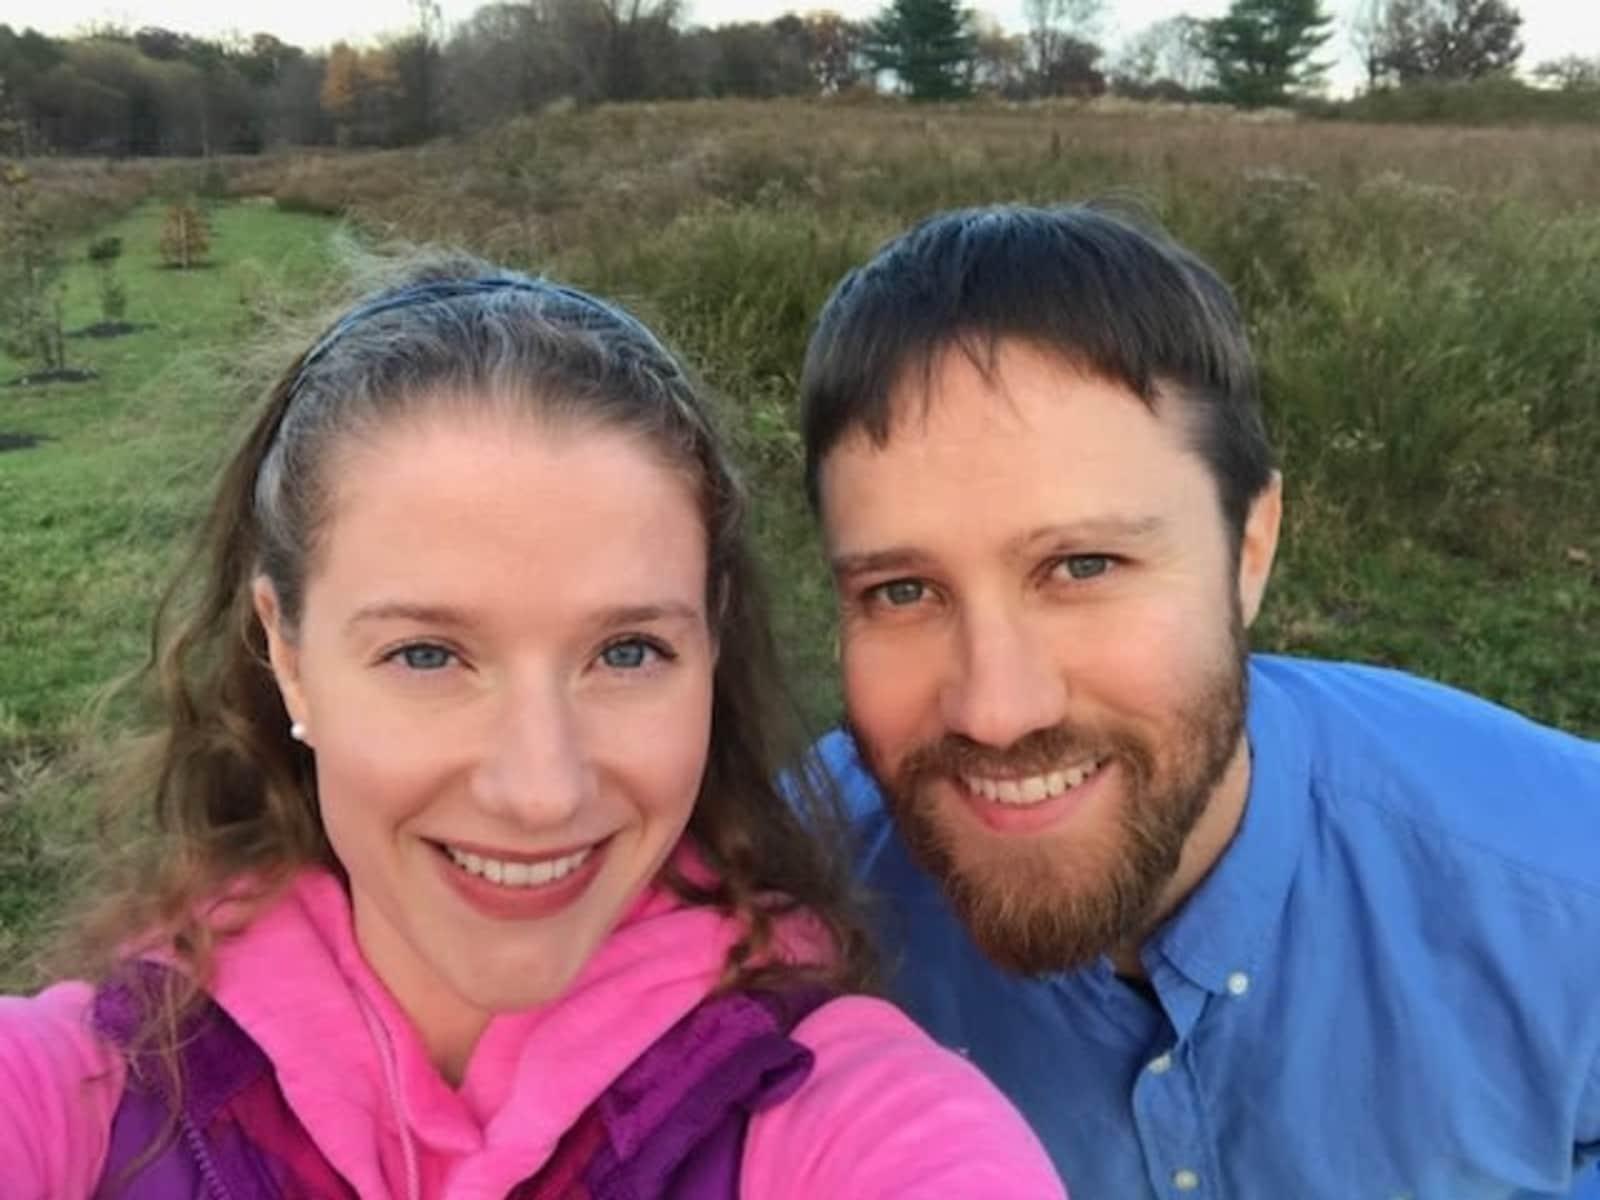 Allison & Justin(we're just friends) from Eldersburg, Maryland, United States